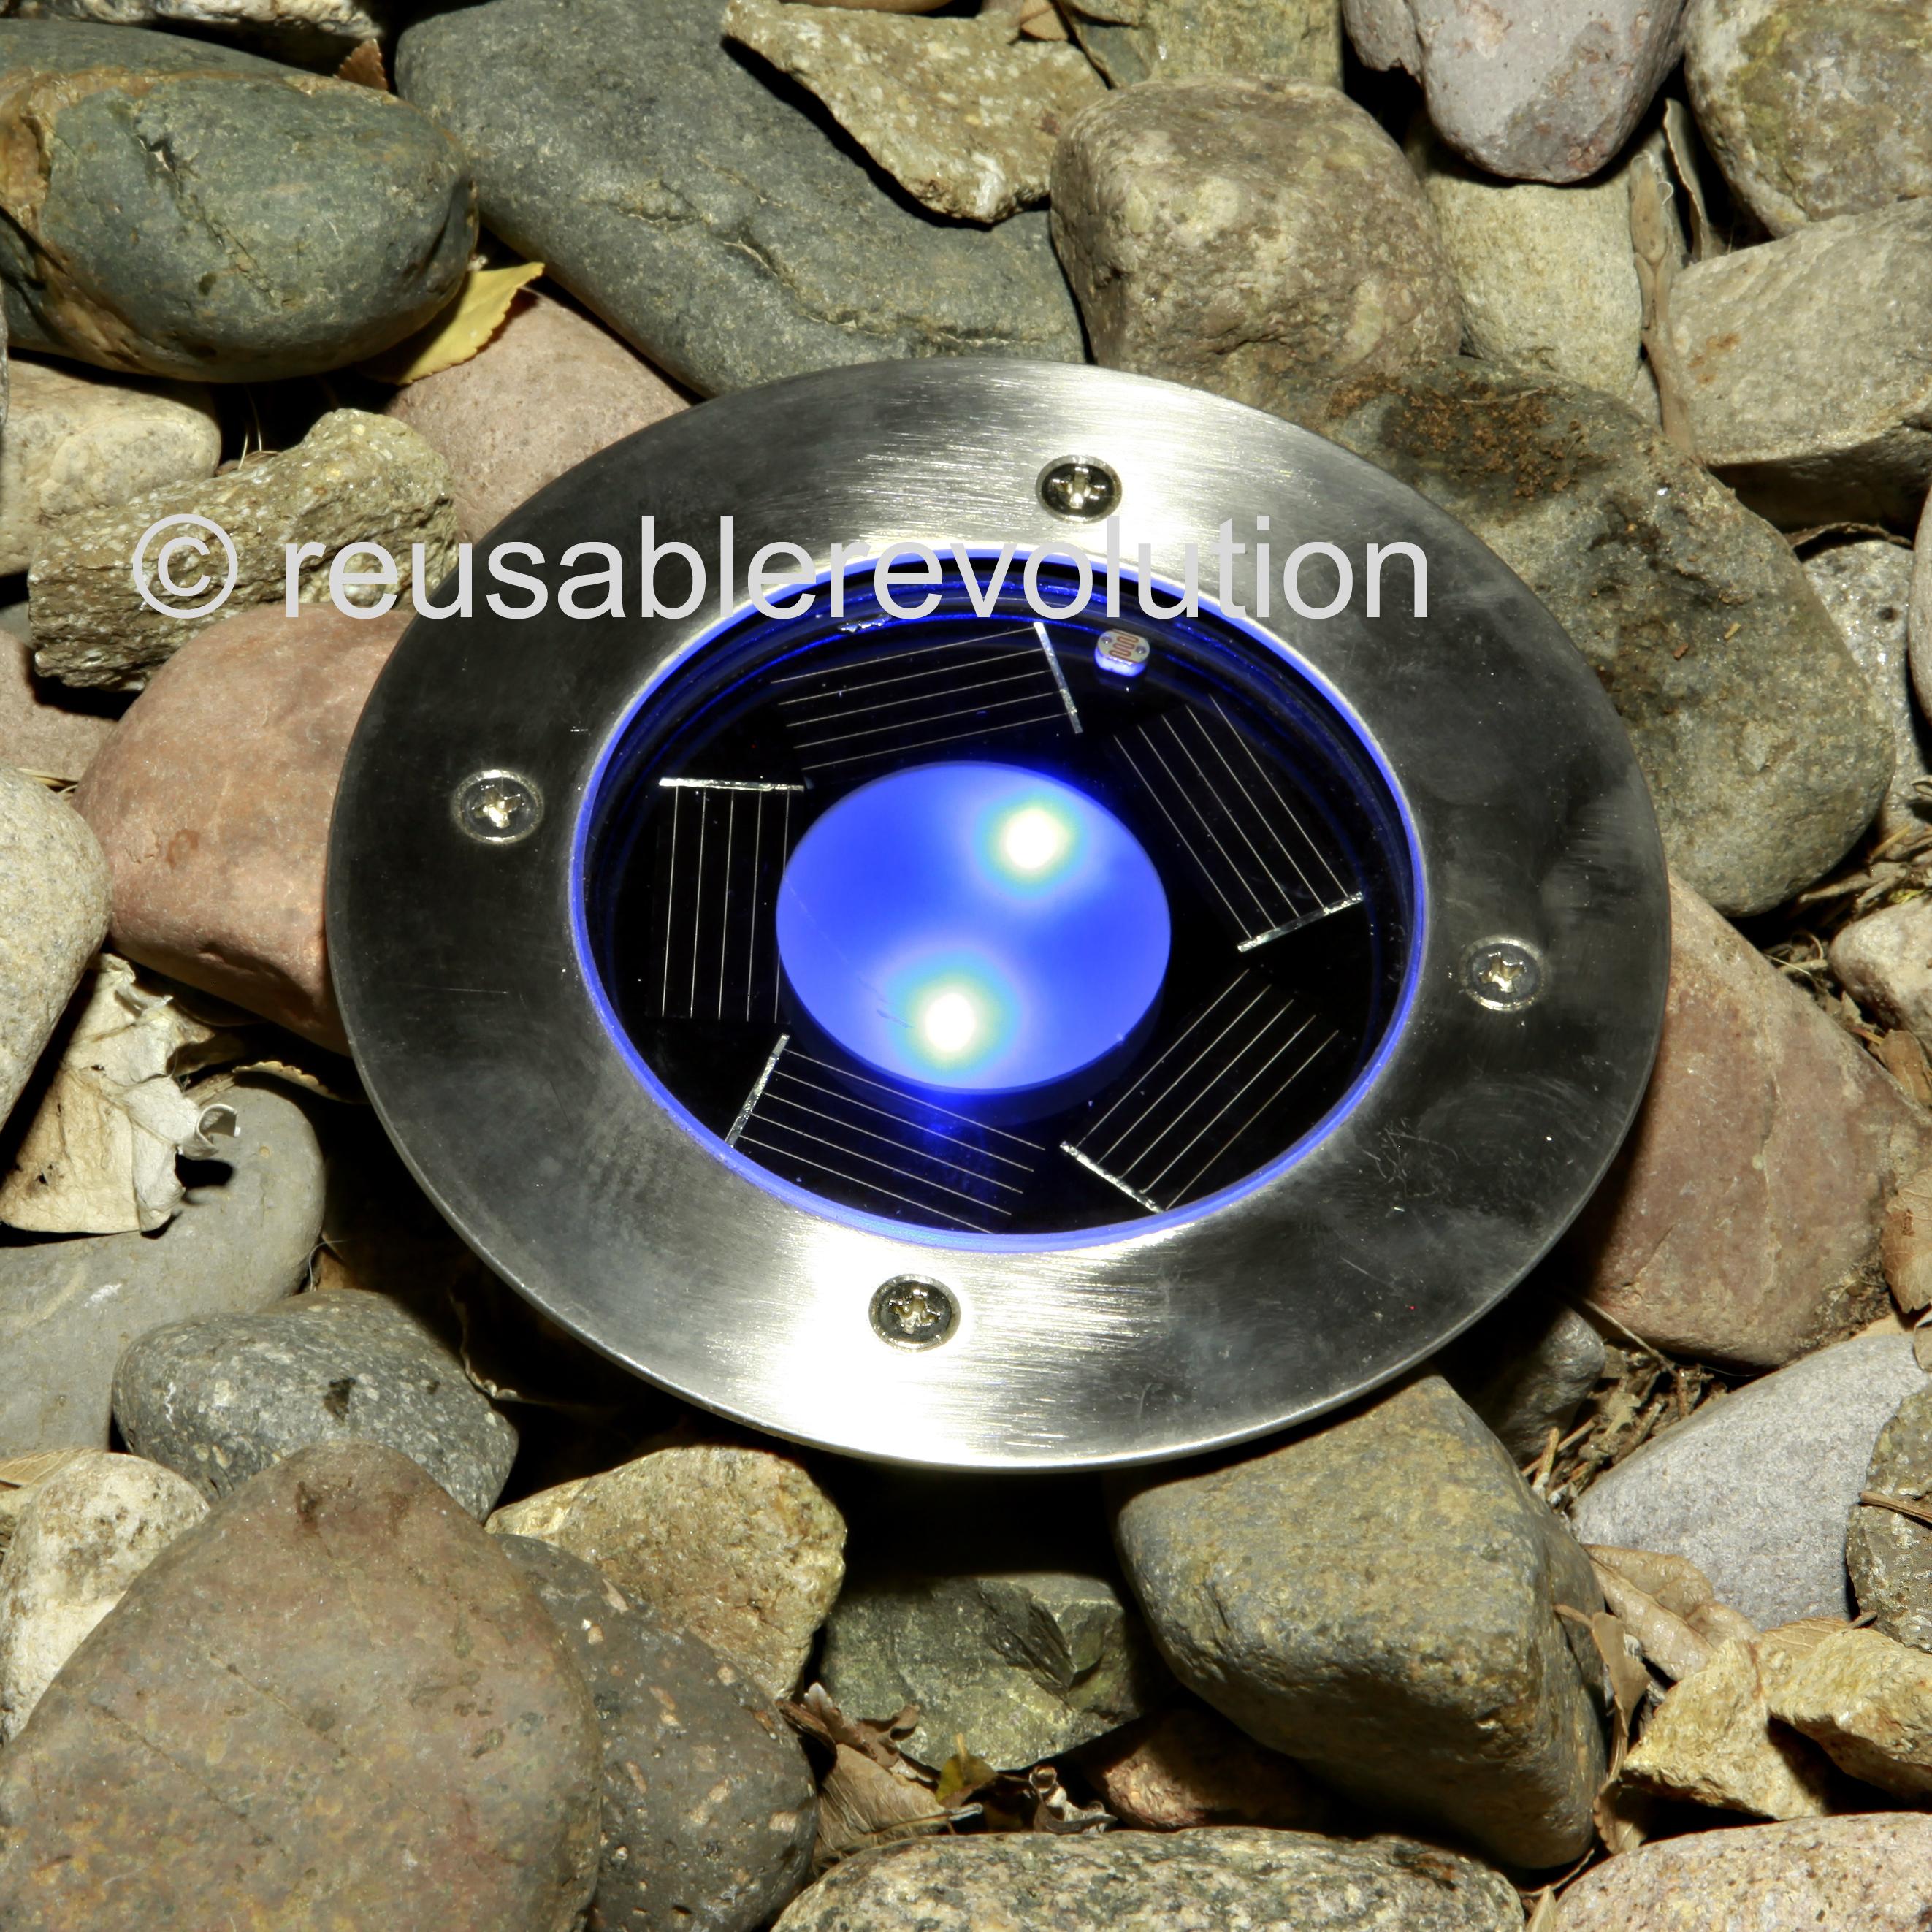 Solar power round recessed deck dock pathway garden led light ebay - 8 Pack White Solar Power Round Recessed Deck Dock Pathway Garden Led Light